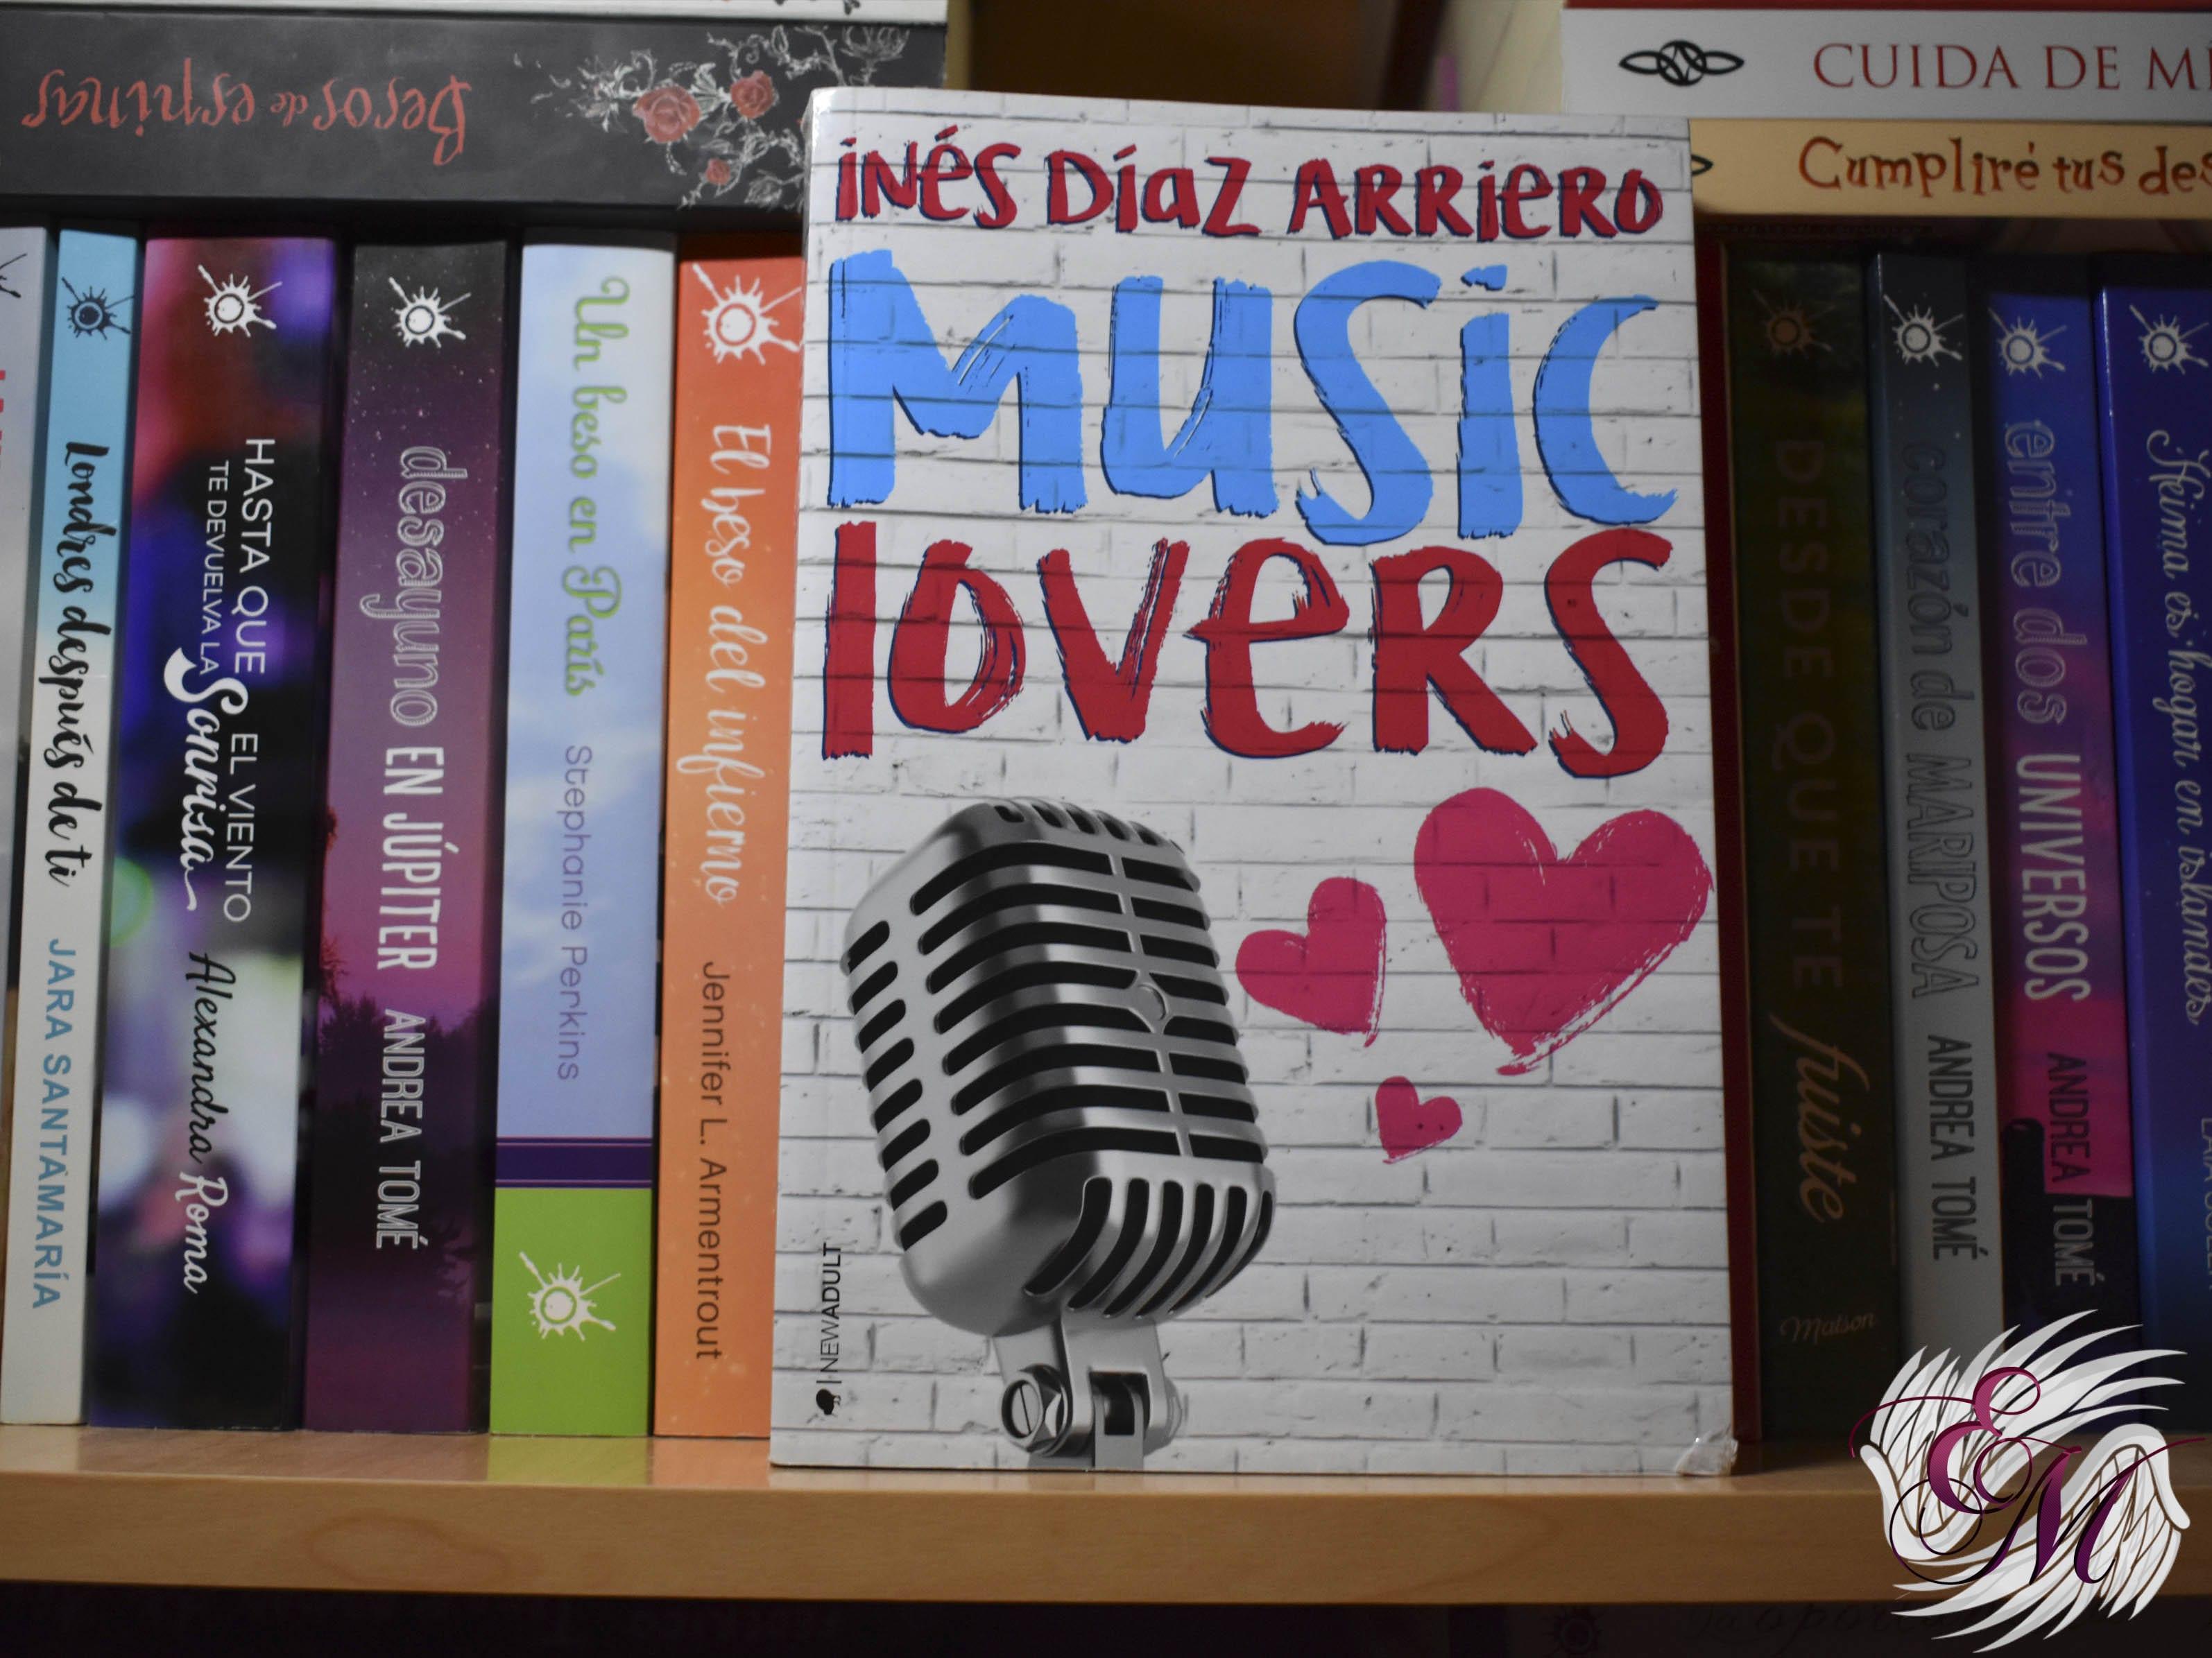 Music lovers, de Inés Díaz Arriero - Reseña